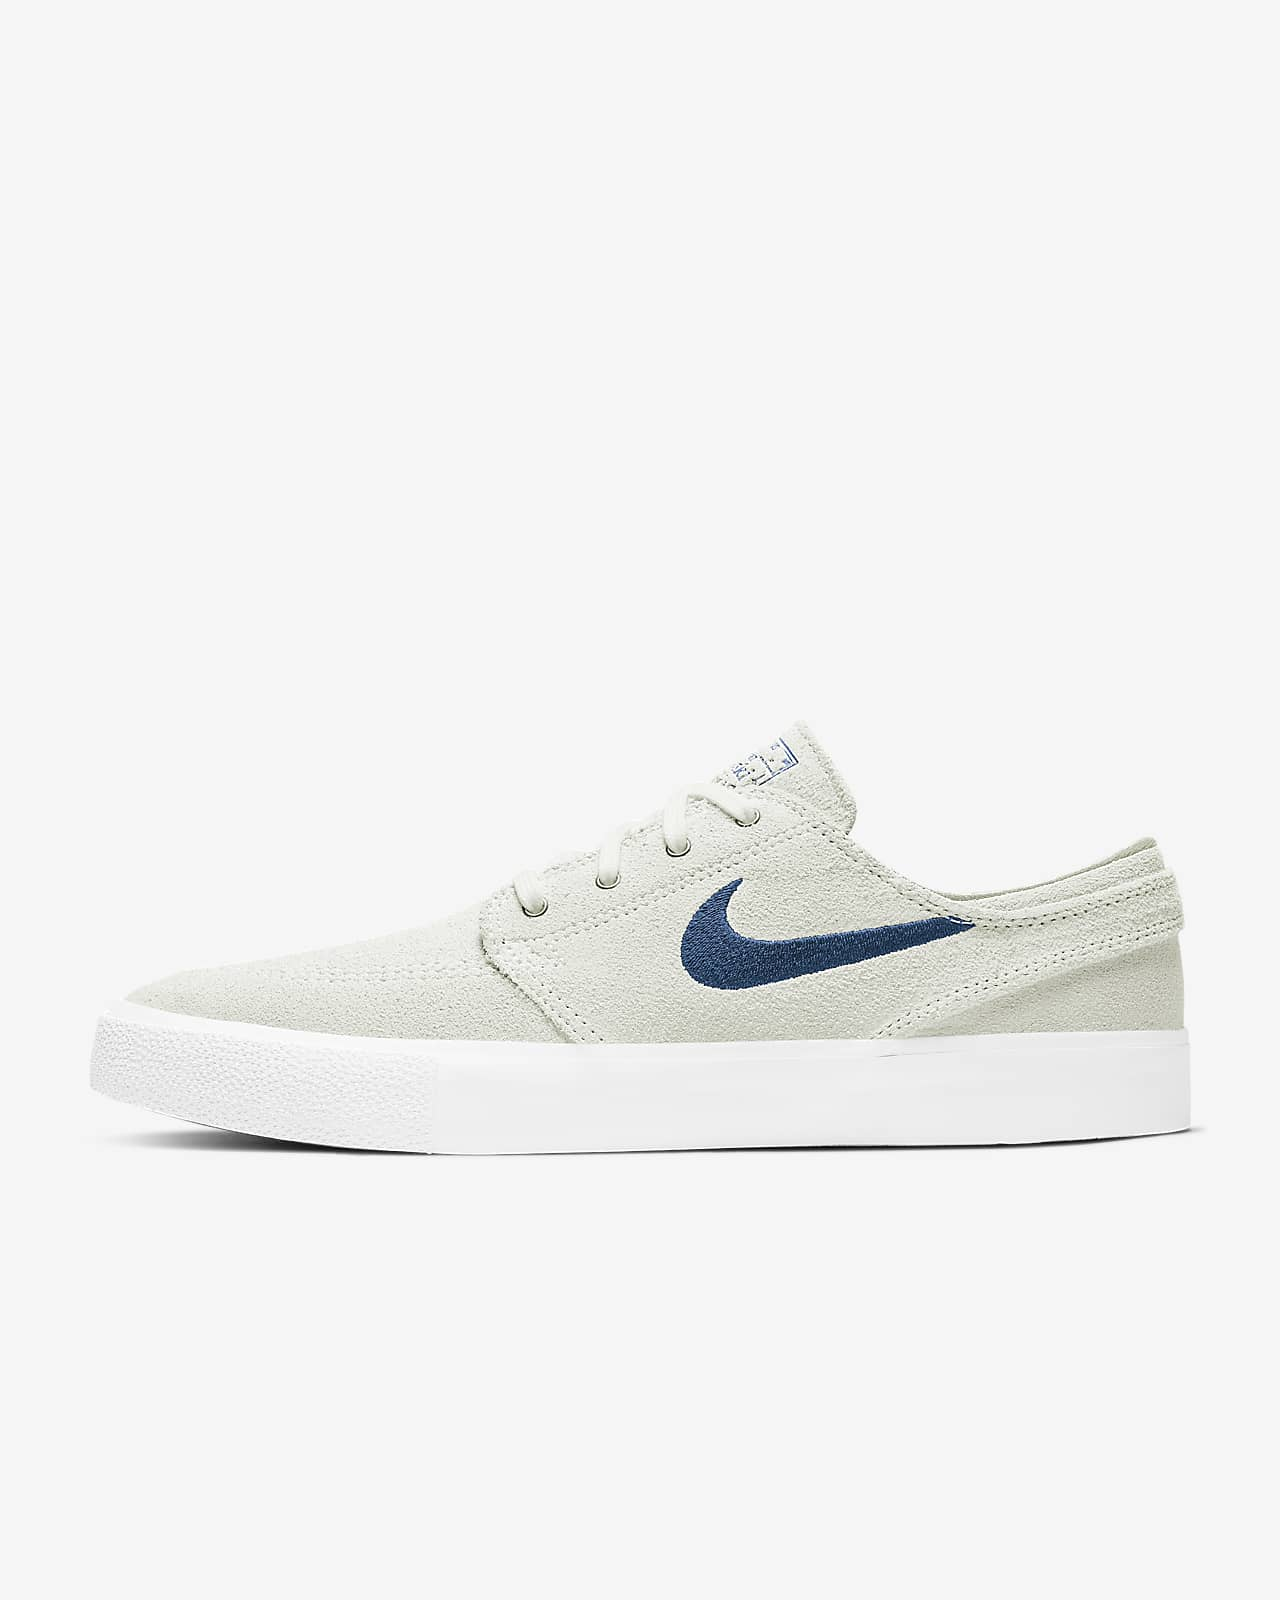 Chaussure de skateboard Nike SB Zoom Stefan Janoski RM. Nike LU